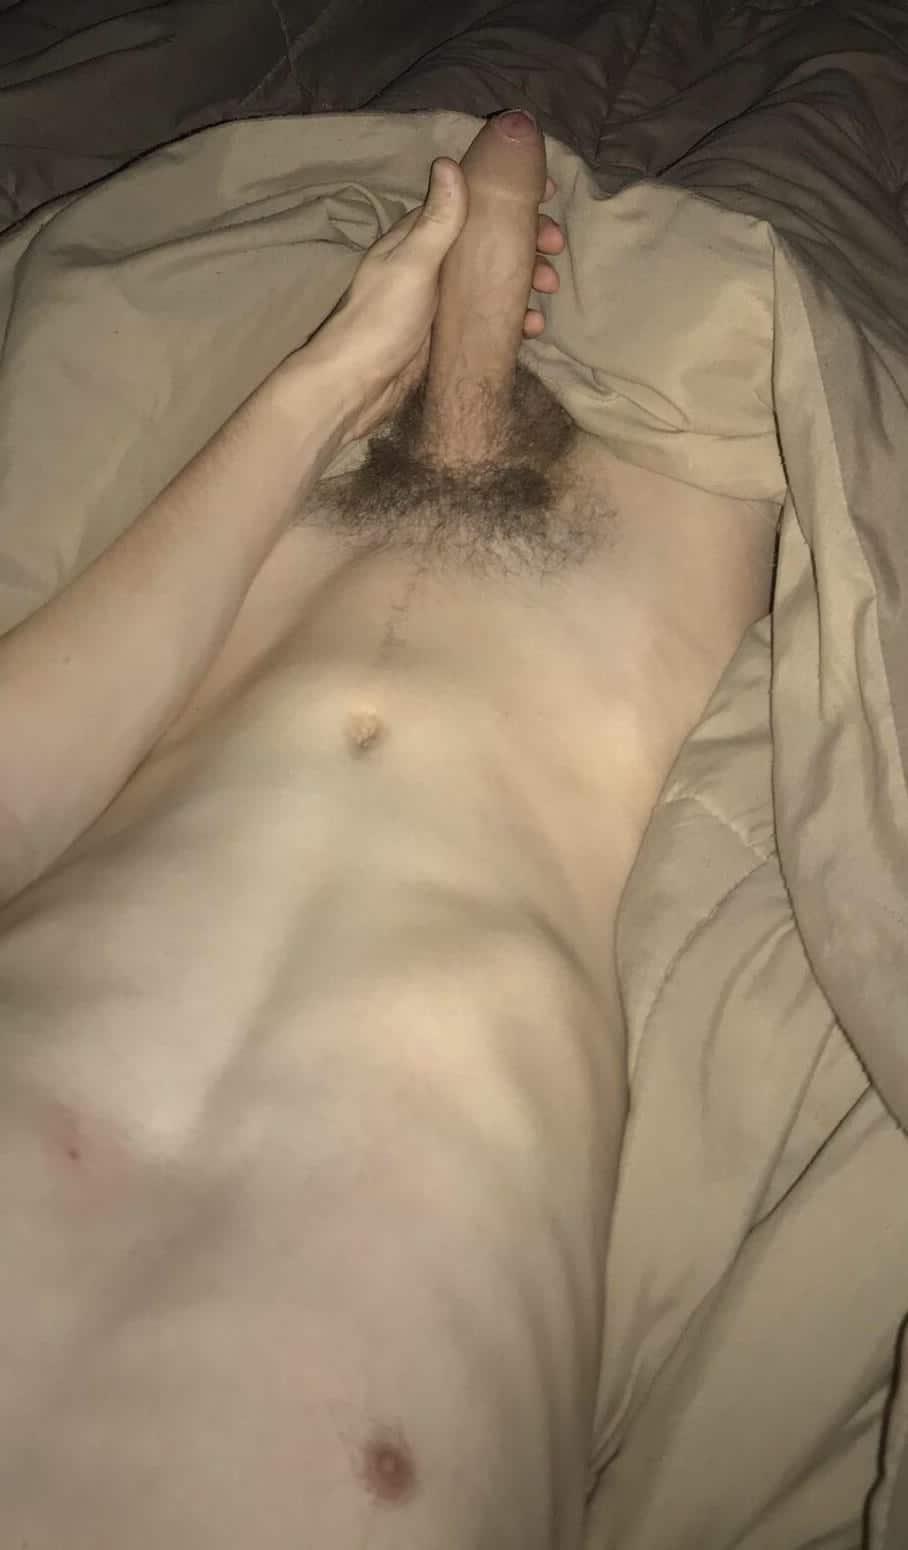 Big hairy uncut cock